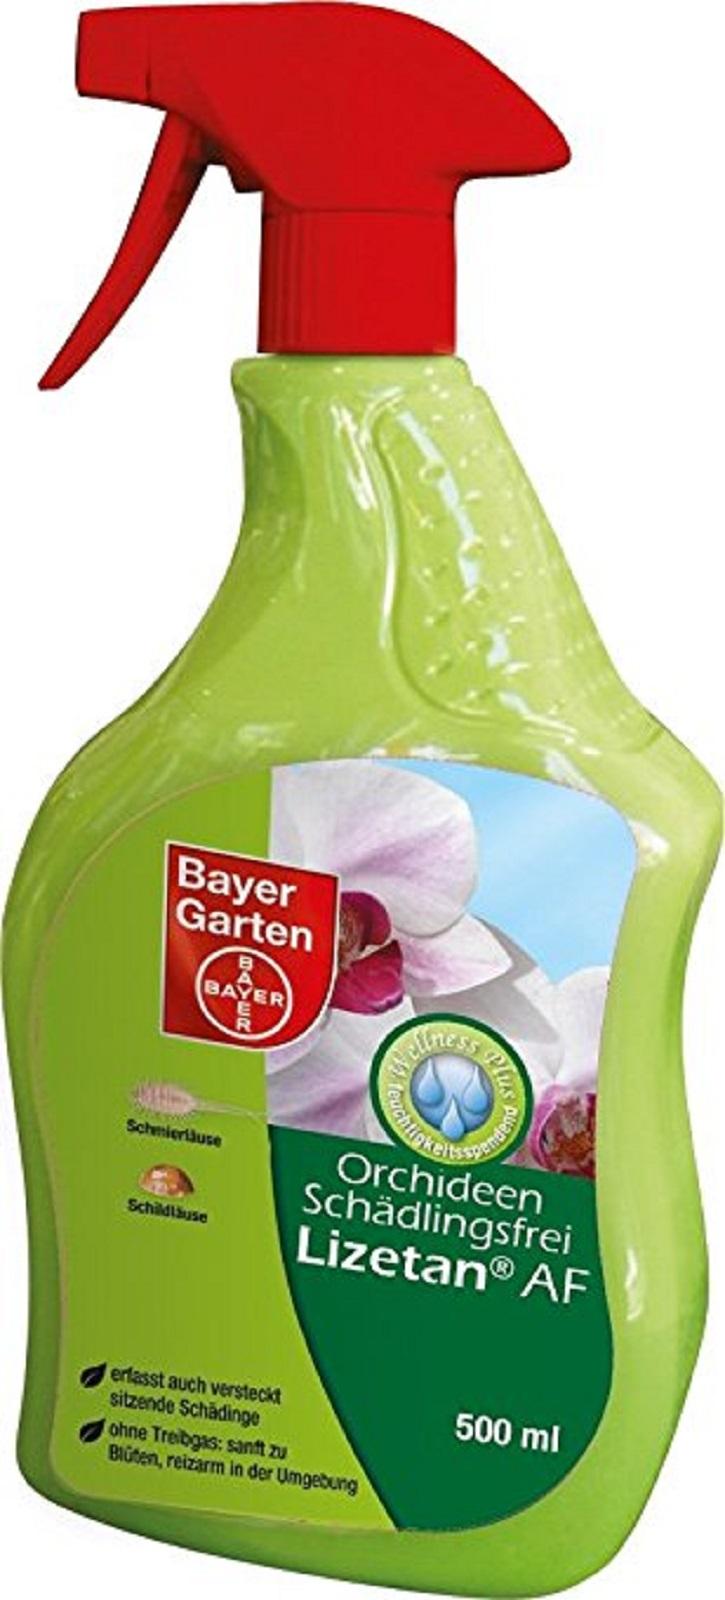 Bayer Orchideen Schädlingsfrei Lizetan AF 500 ml Sprühflasche